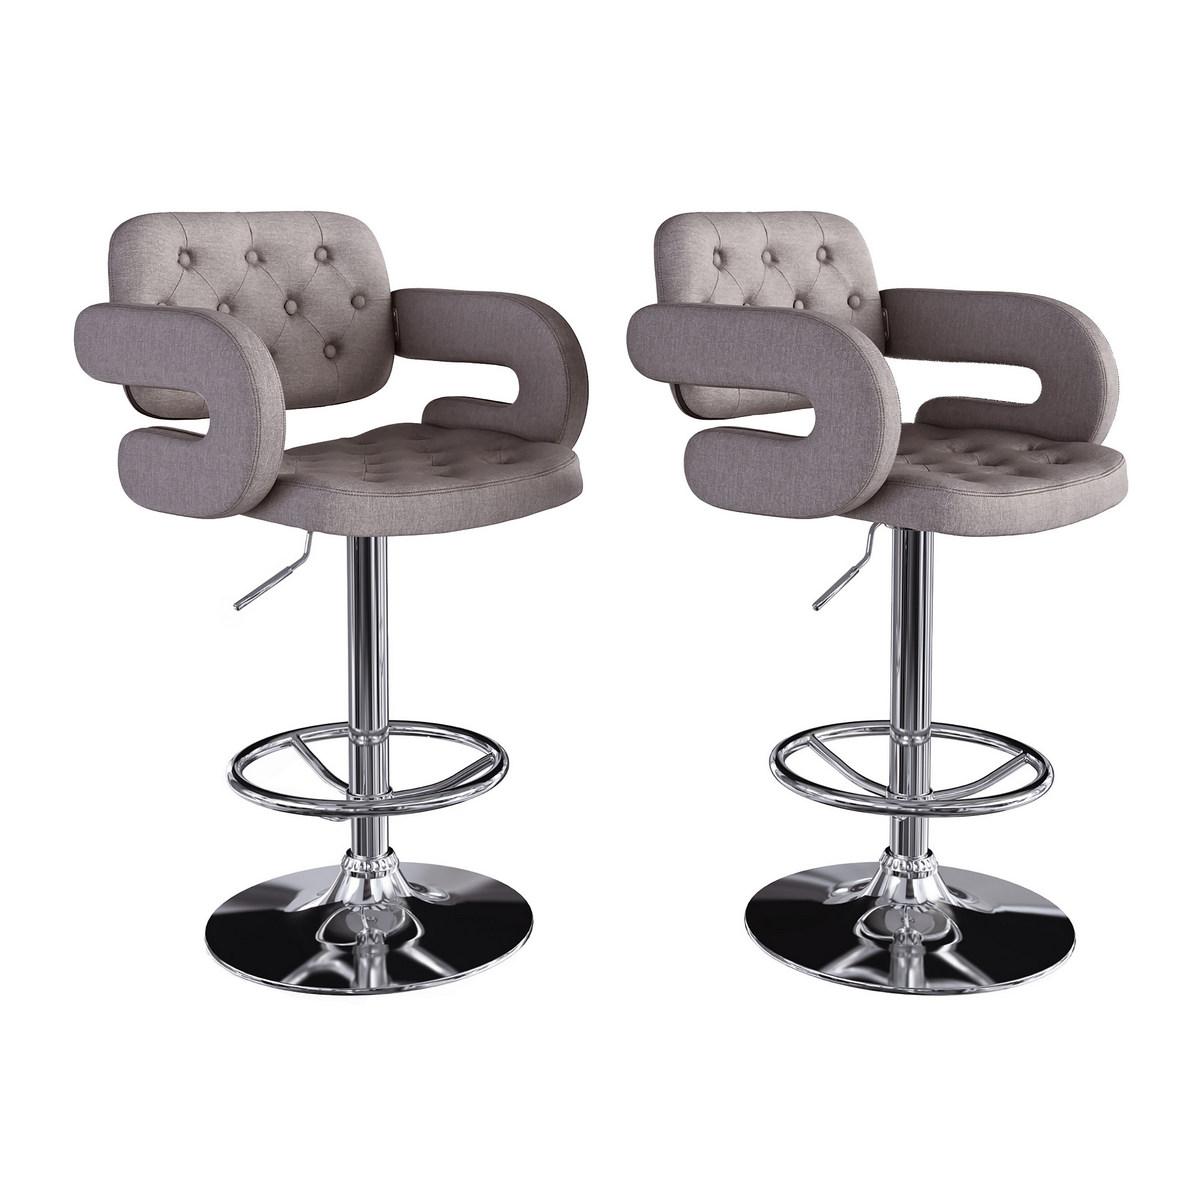 CorLiving DAB-224-B Adjustable Tufted Medium Grey Fabric Barstool w/ Armrests, set of 2